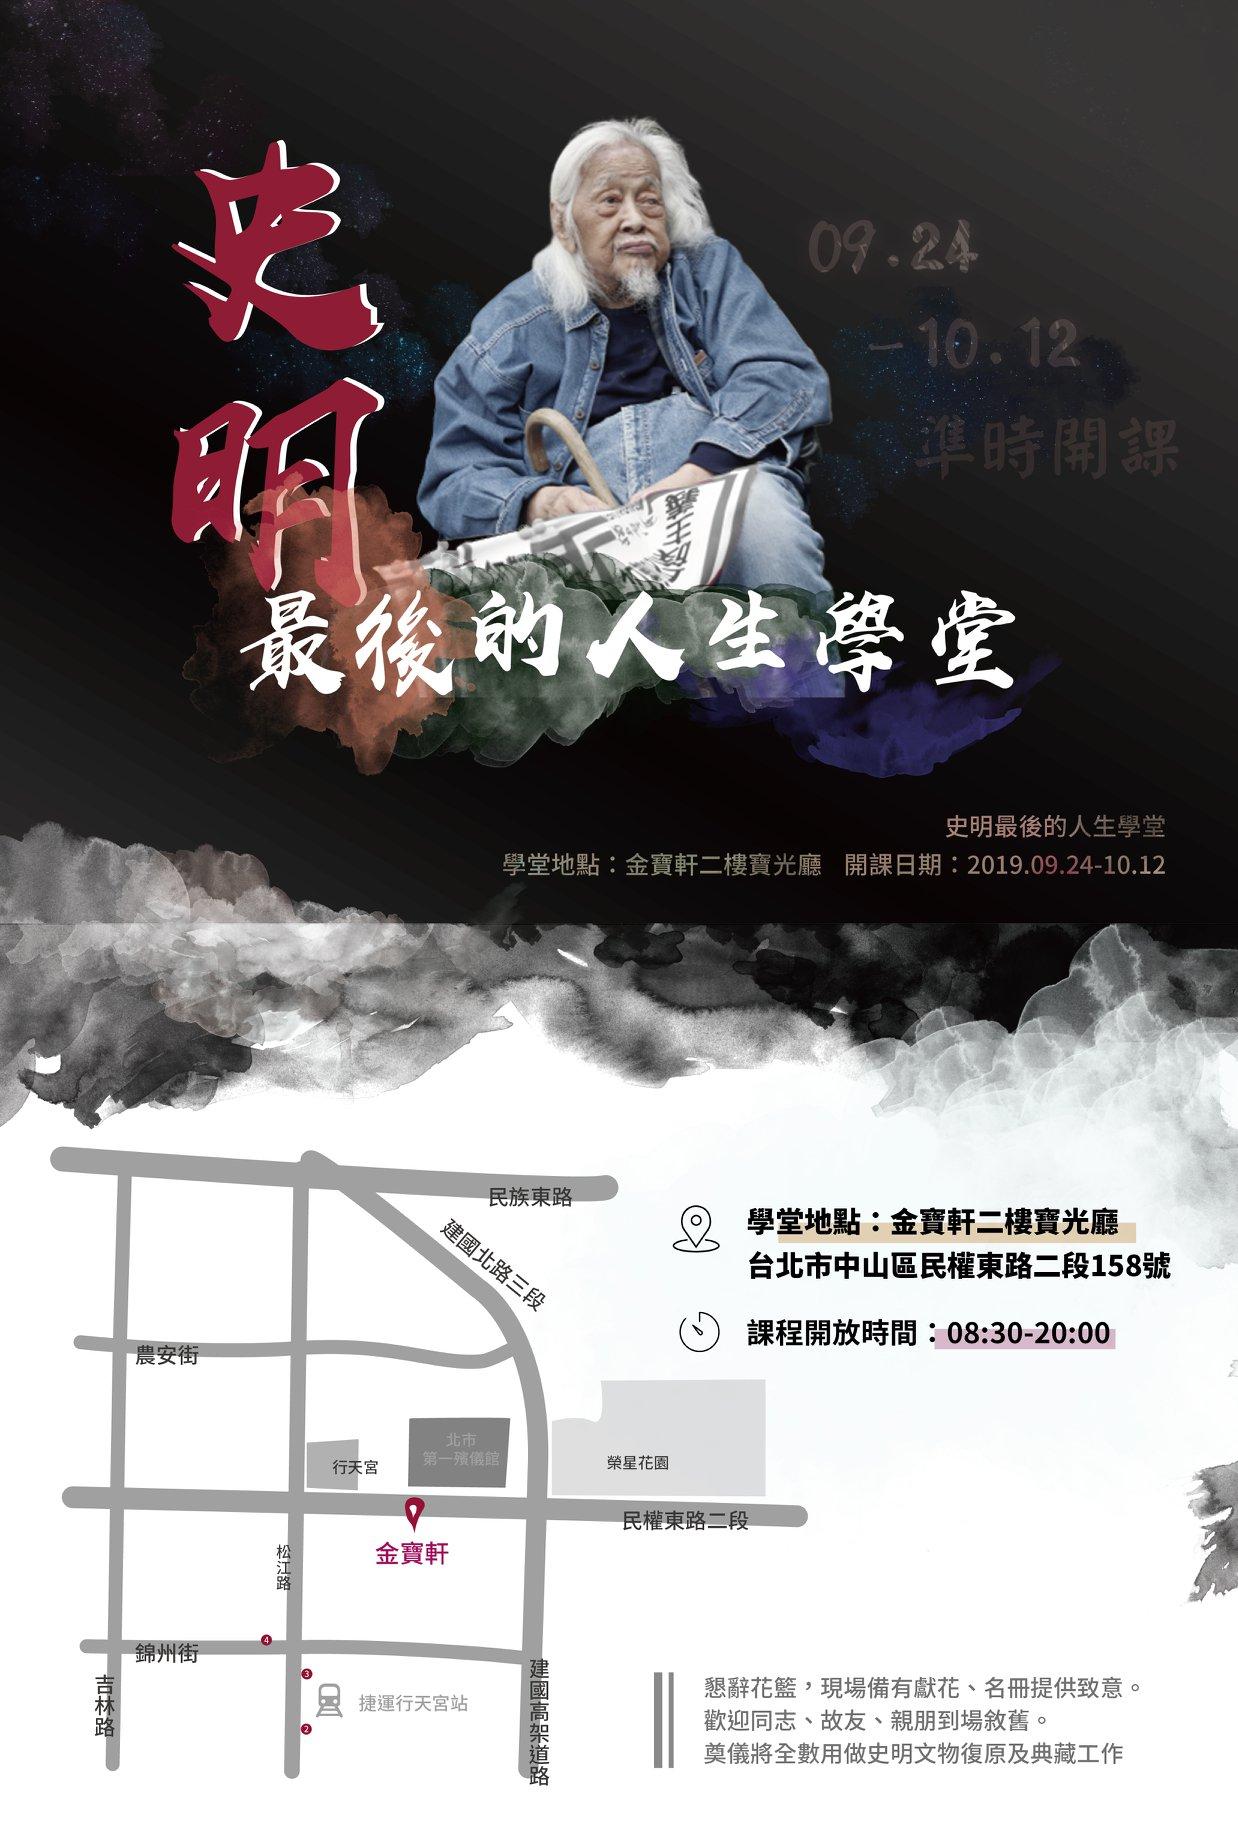 SB flyer with details on memorial 9.24-10.12.jpg